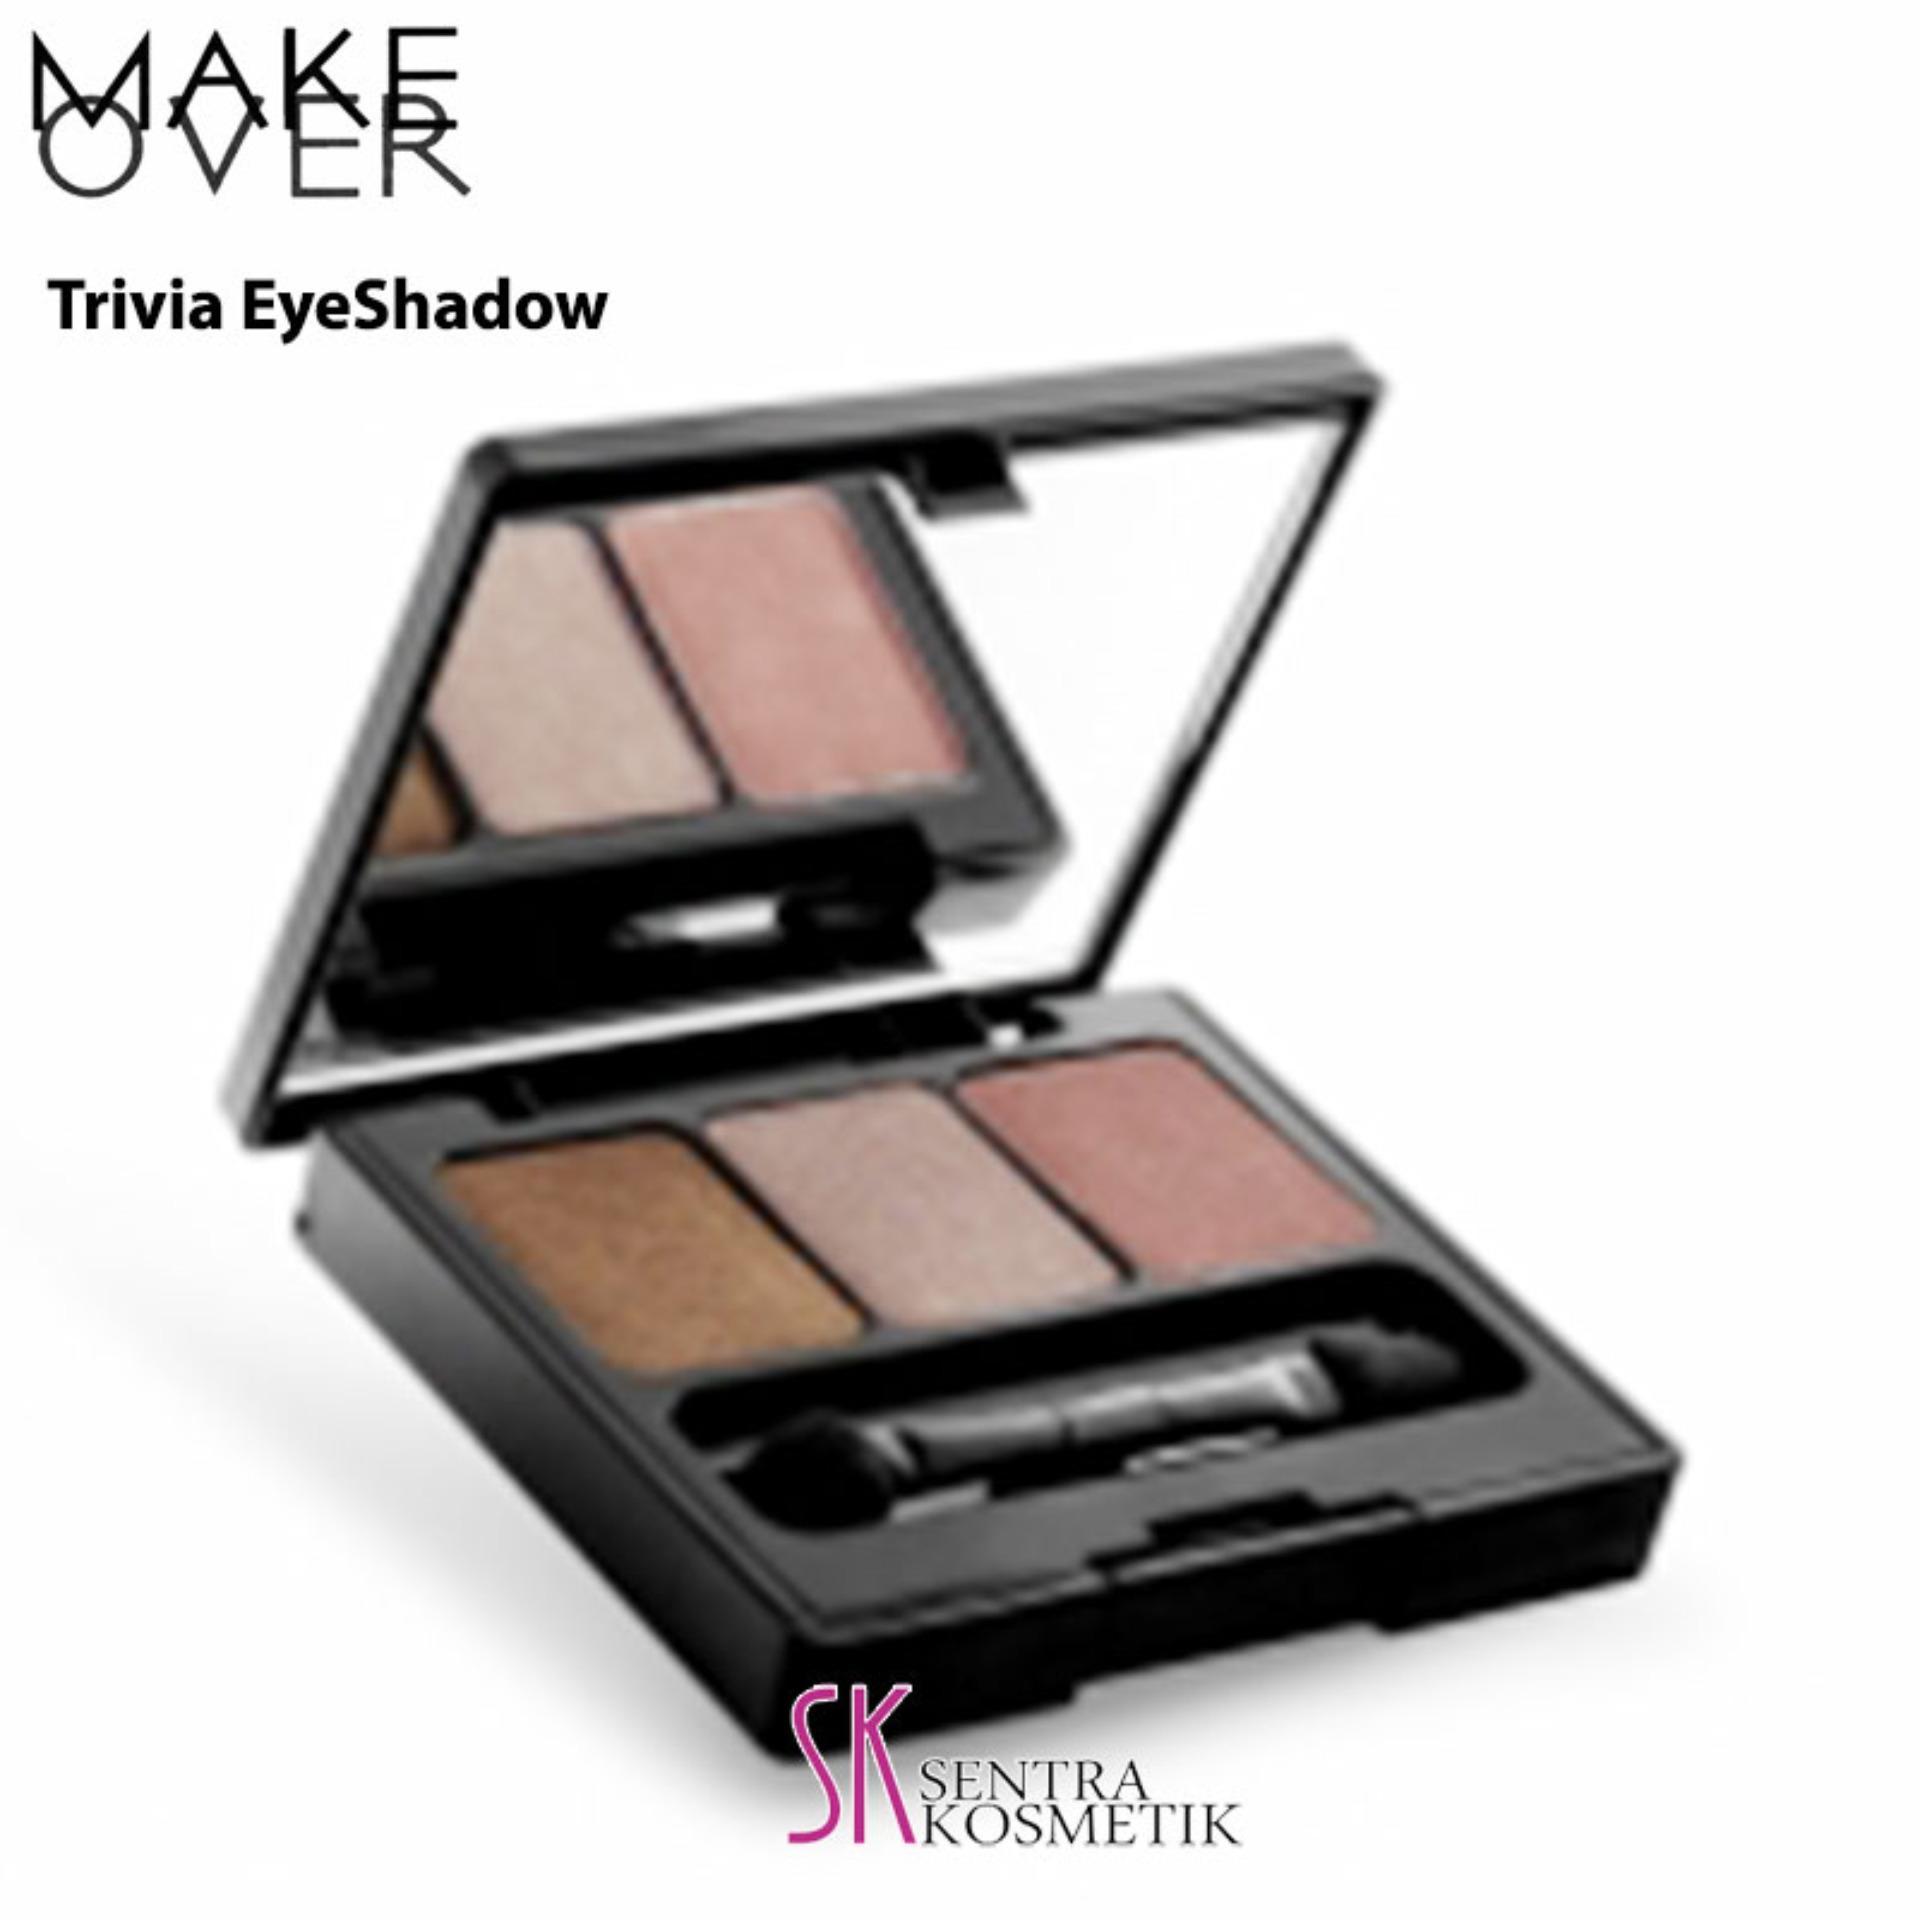 MAKE OVER Trivia Eye Shadow - Natural Nude